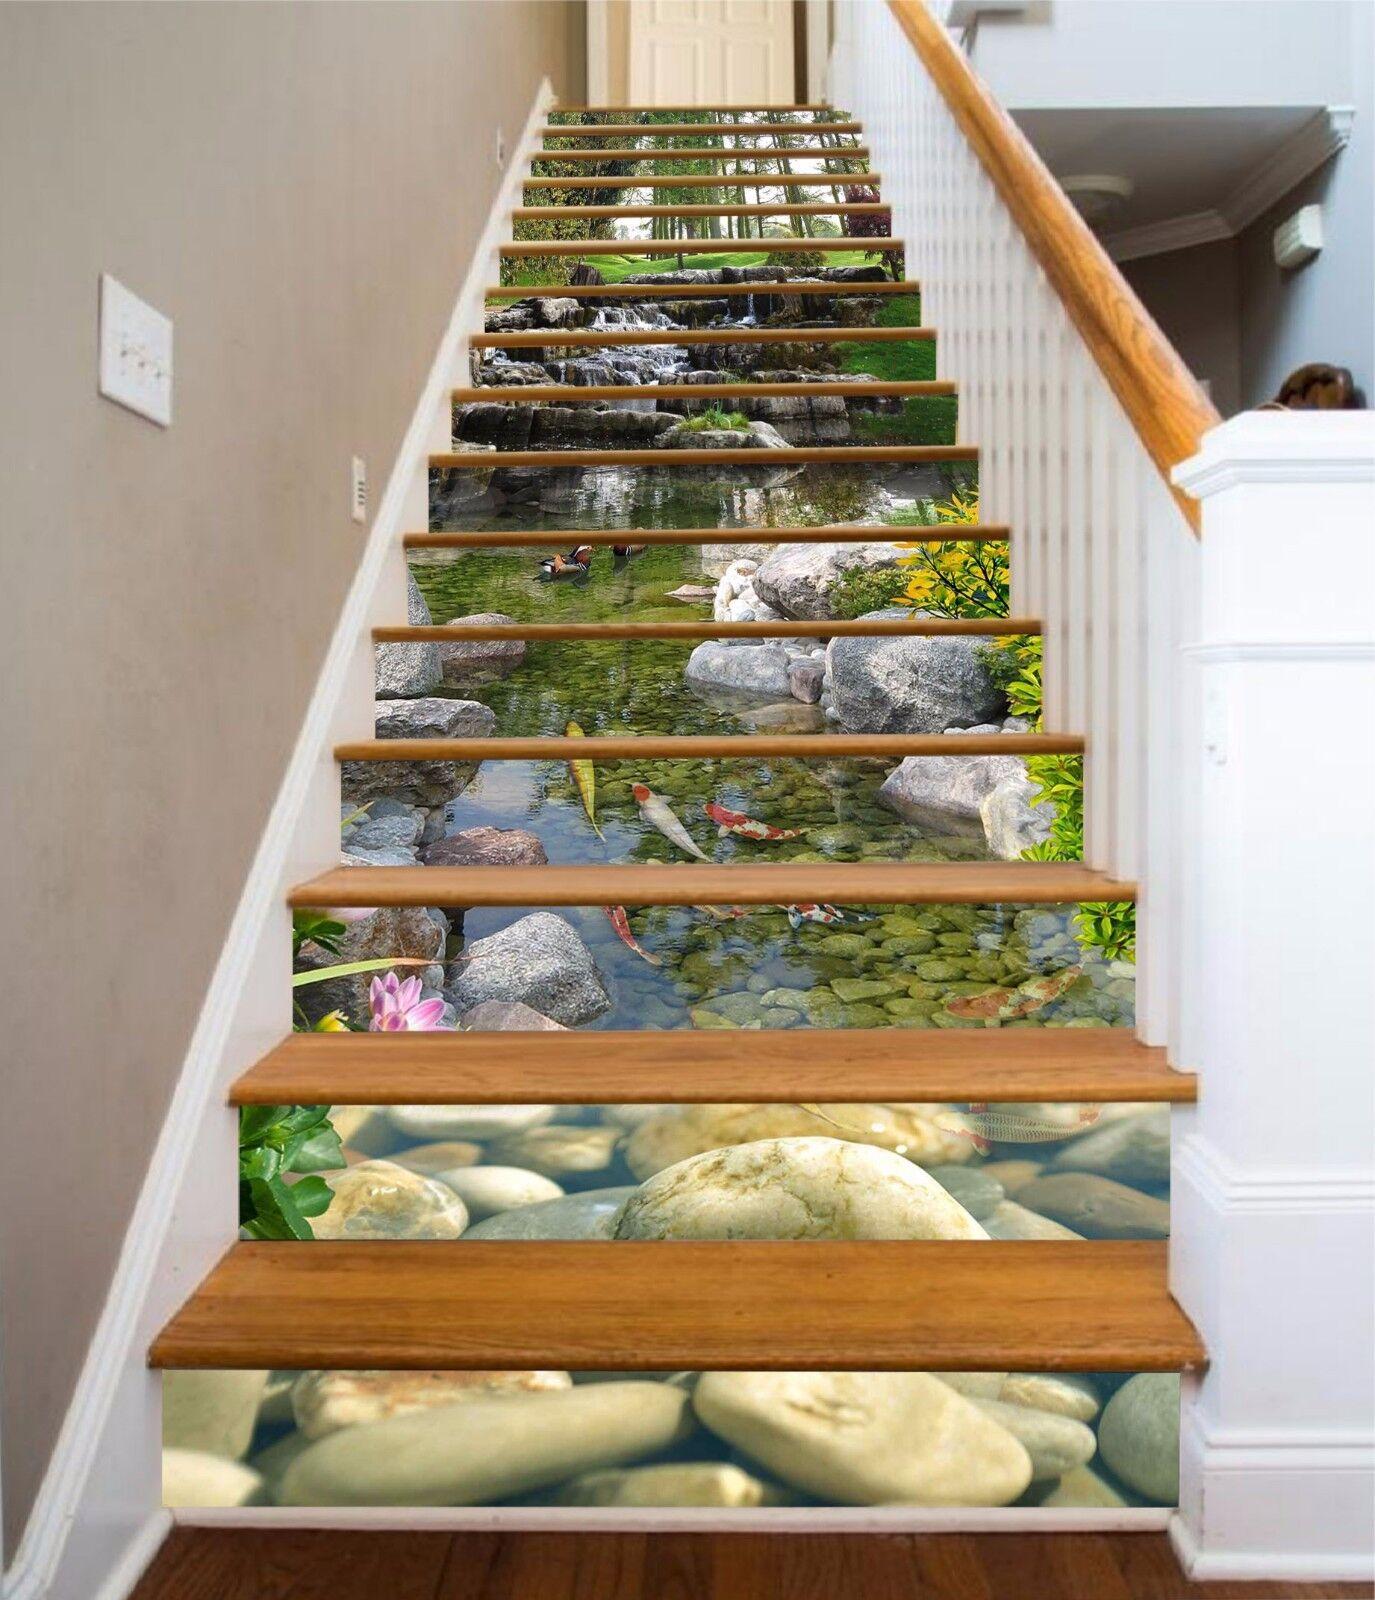 3D Pond Fish Scene 134 Risers Decoration Photo Mural Vinyl Decal Wallpaper CA